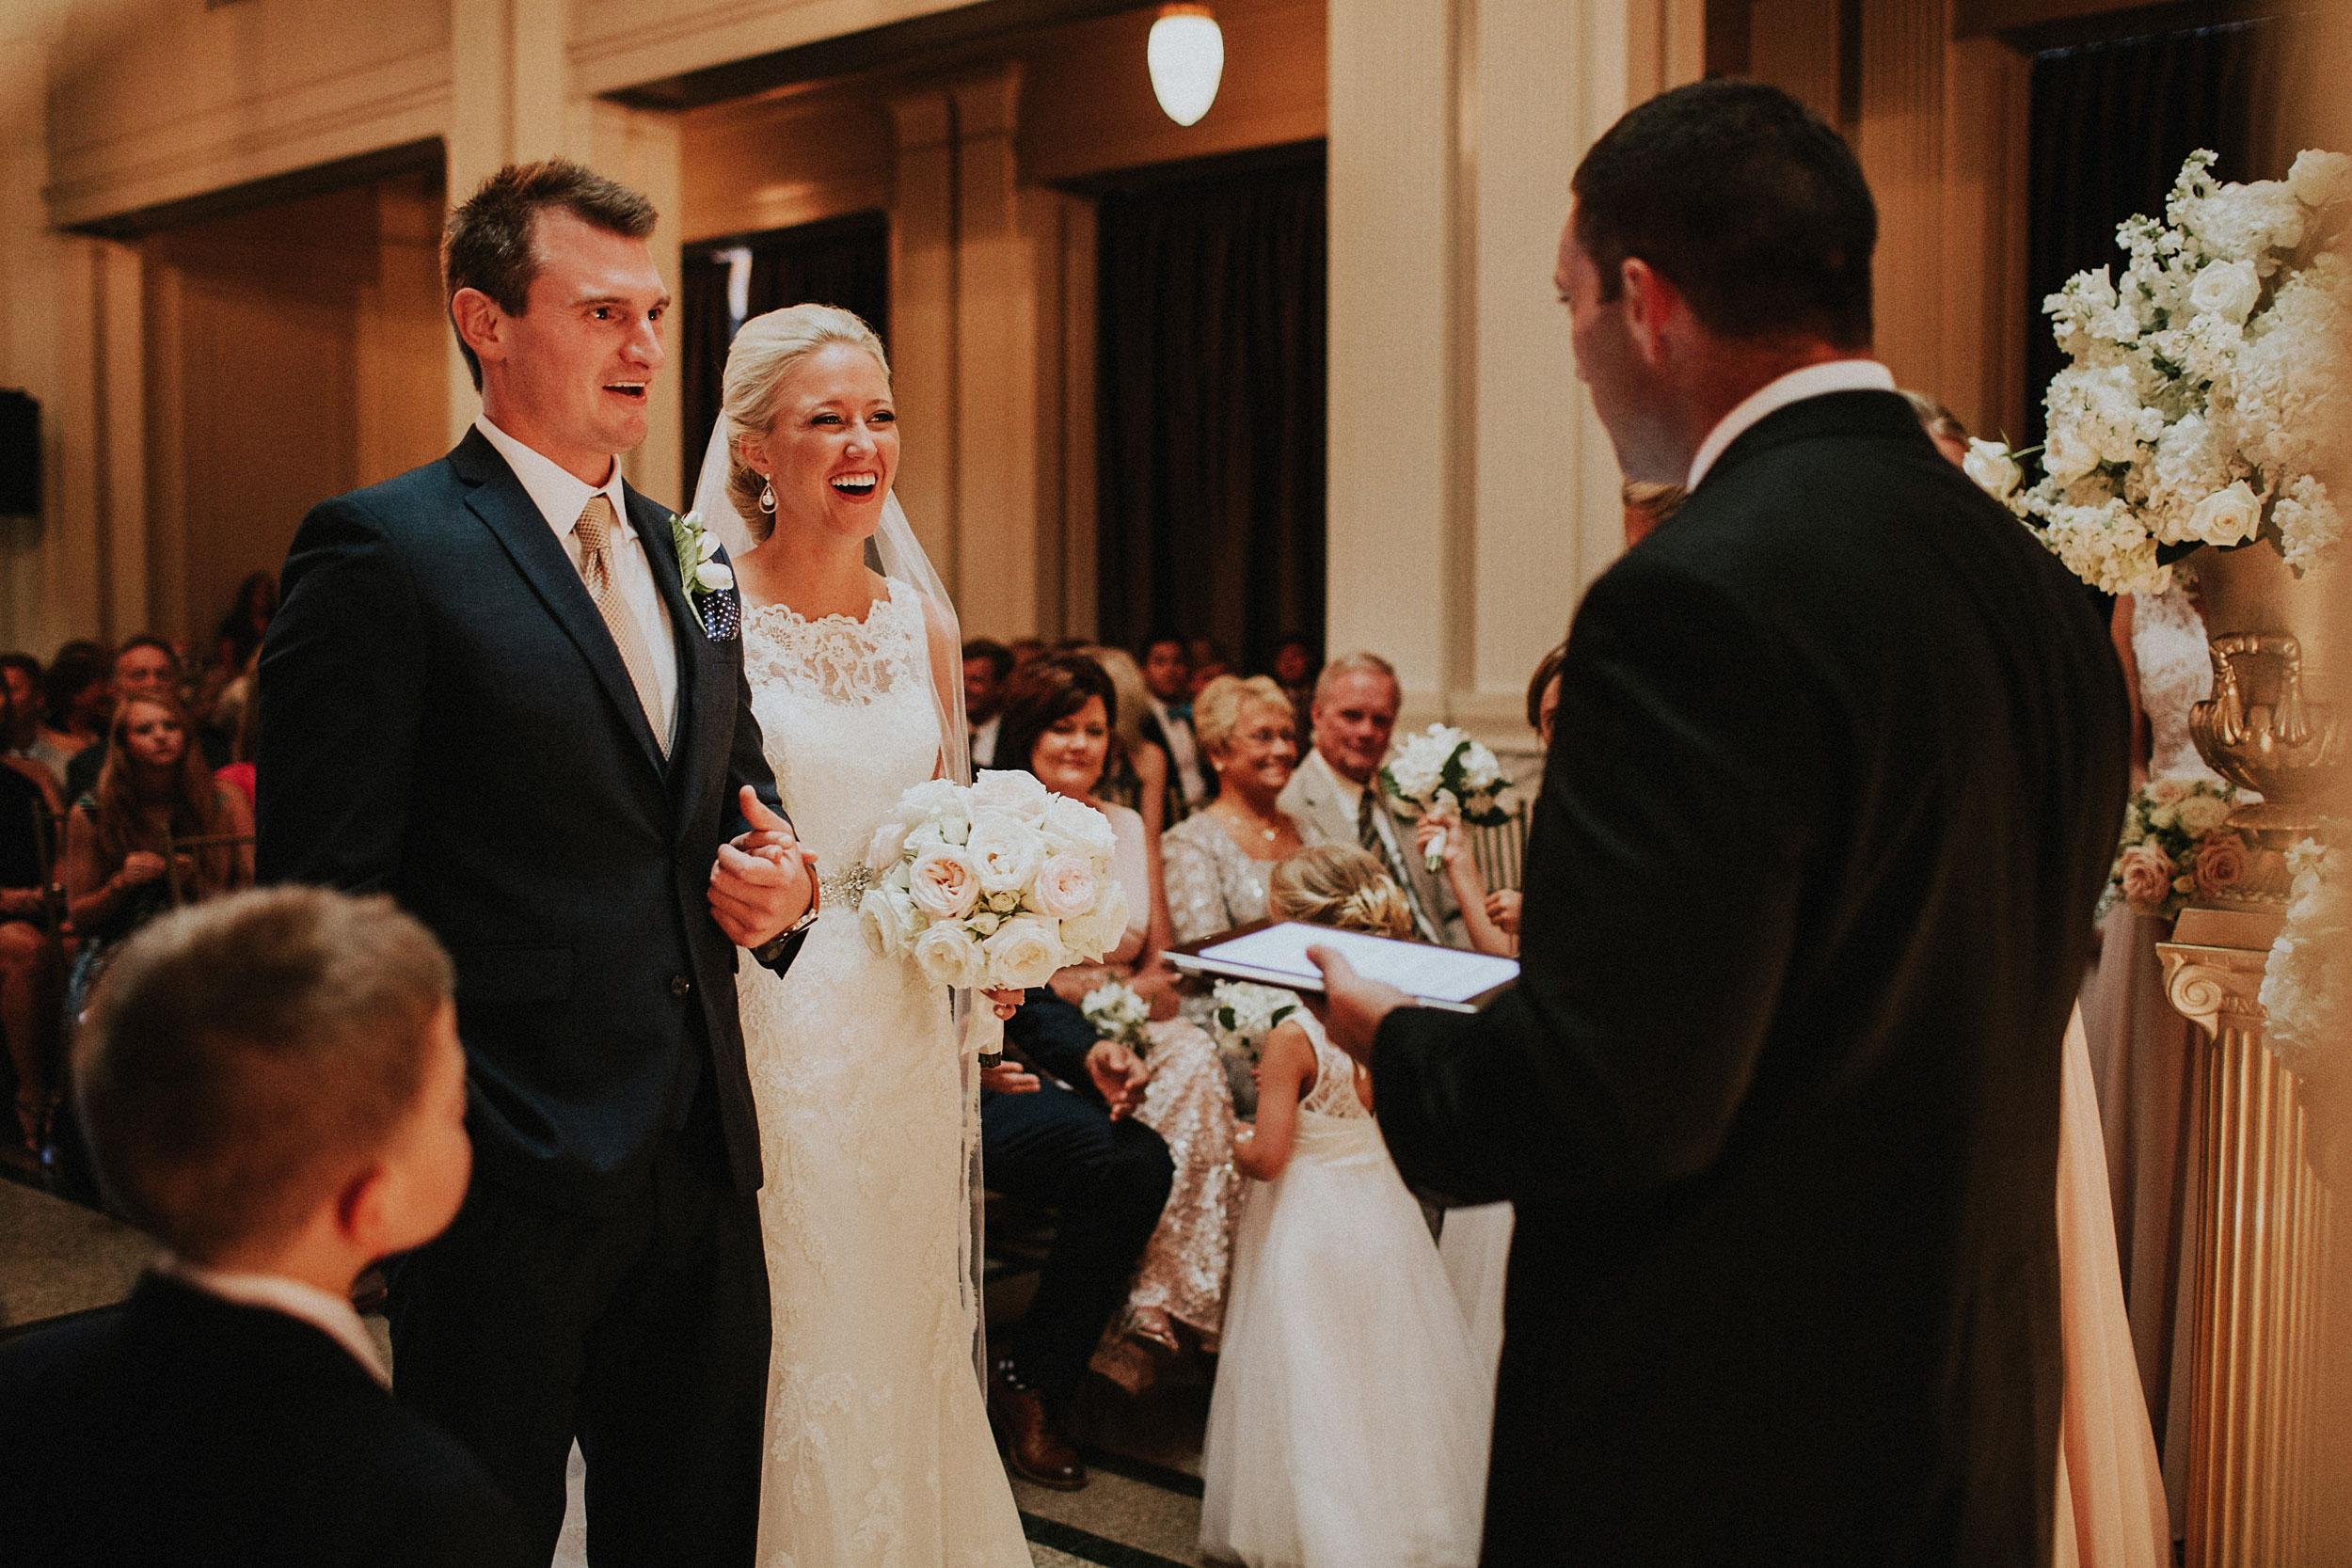 olmsted-wedding-louisville-kentucky-027.JPG